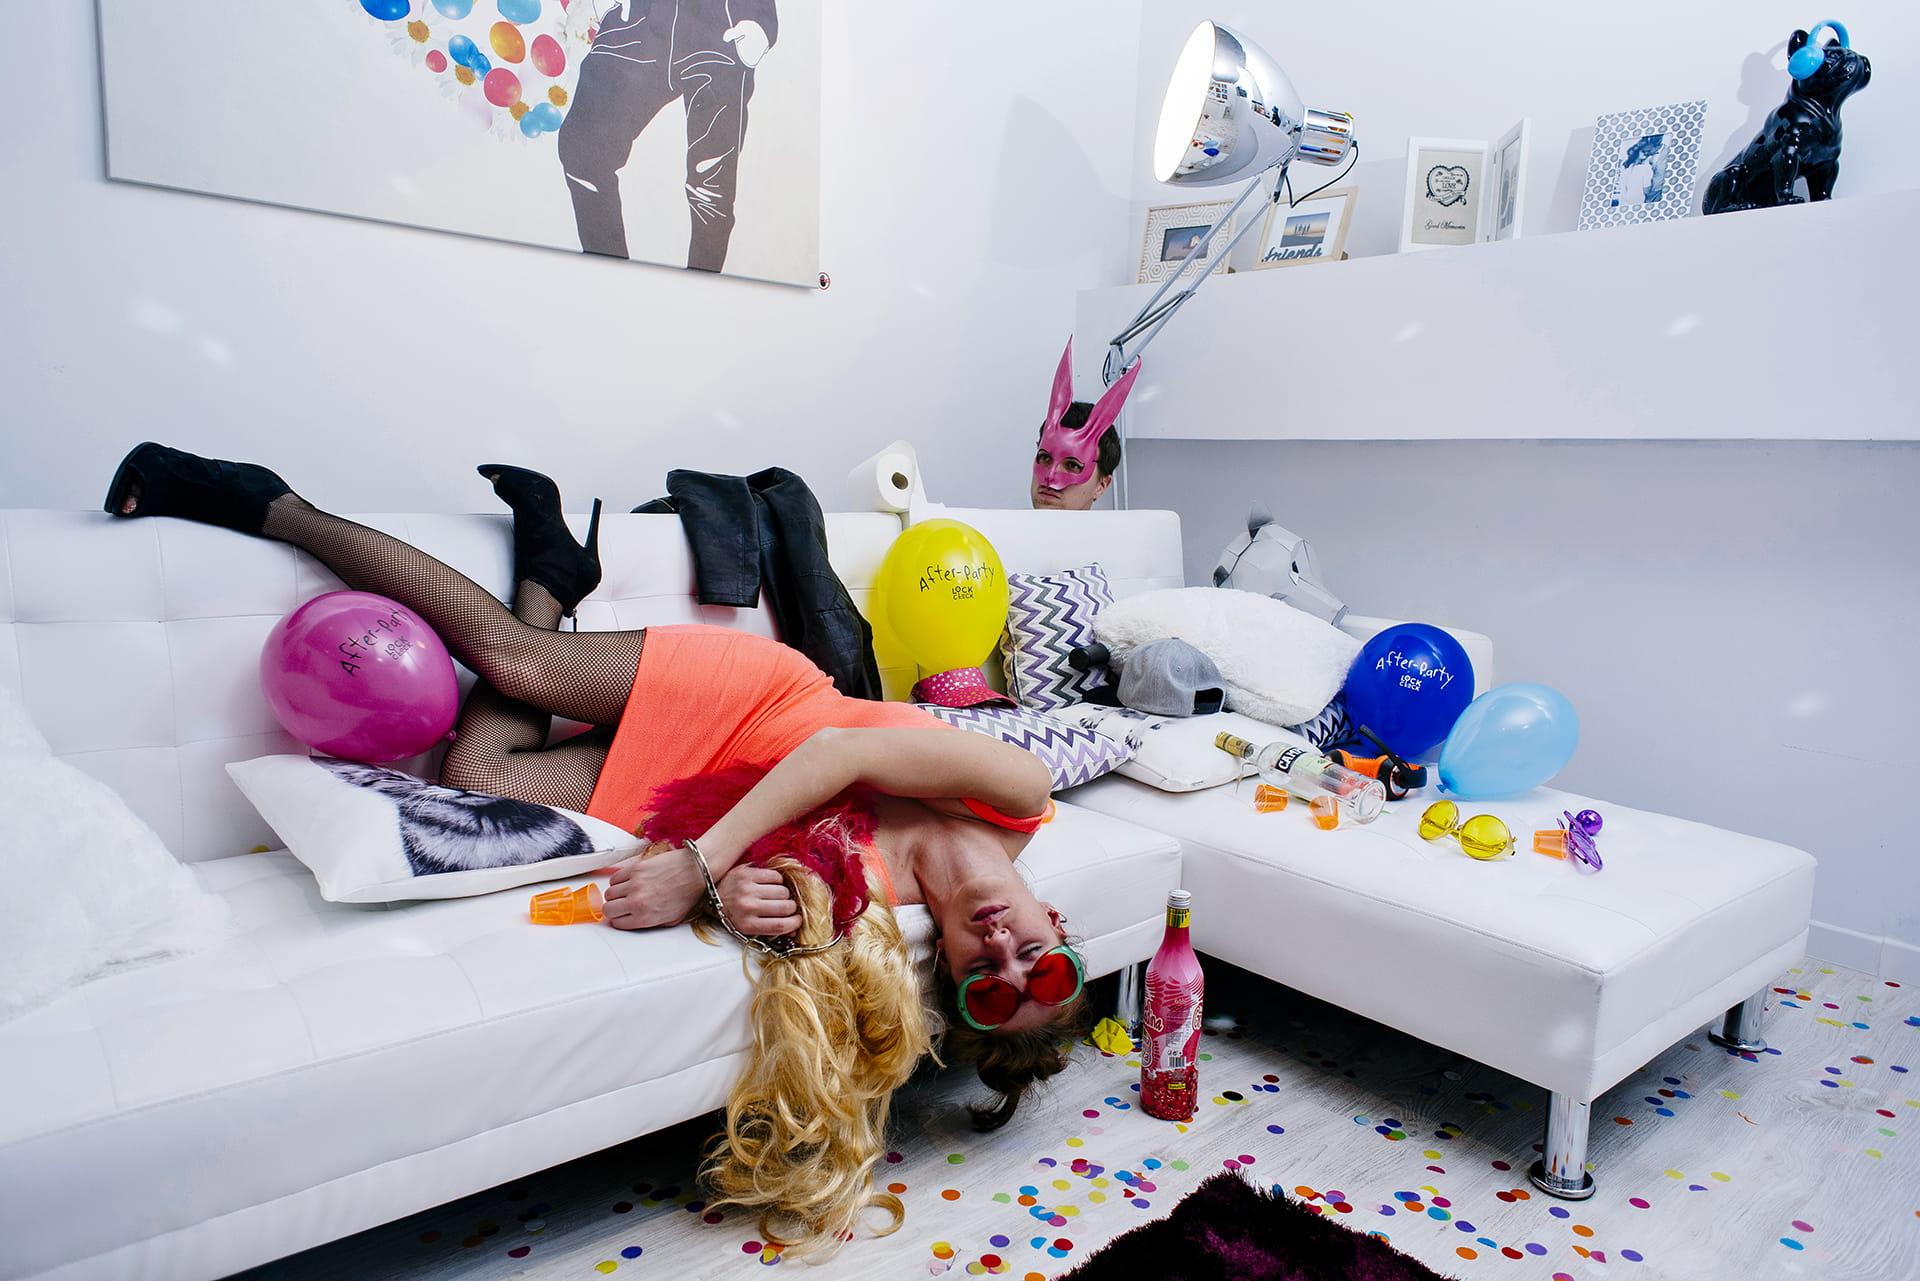 bacco experiences - After Party de Lock Clock